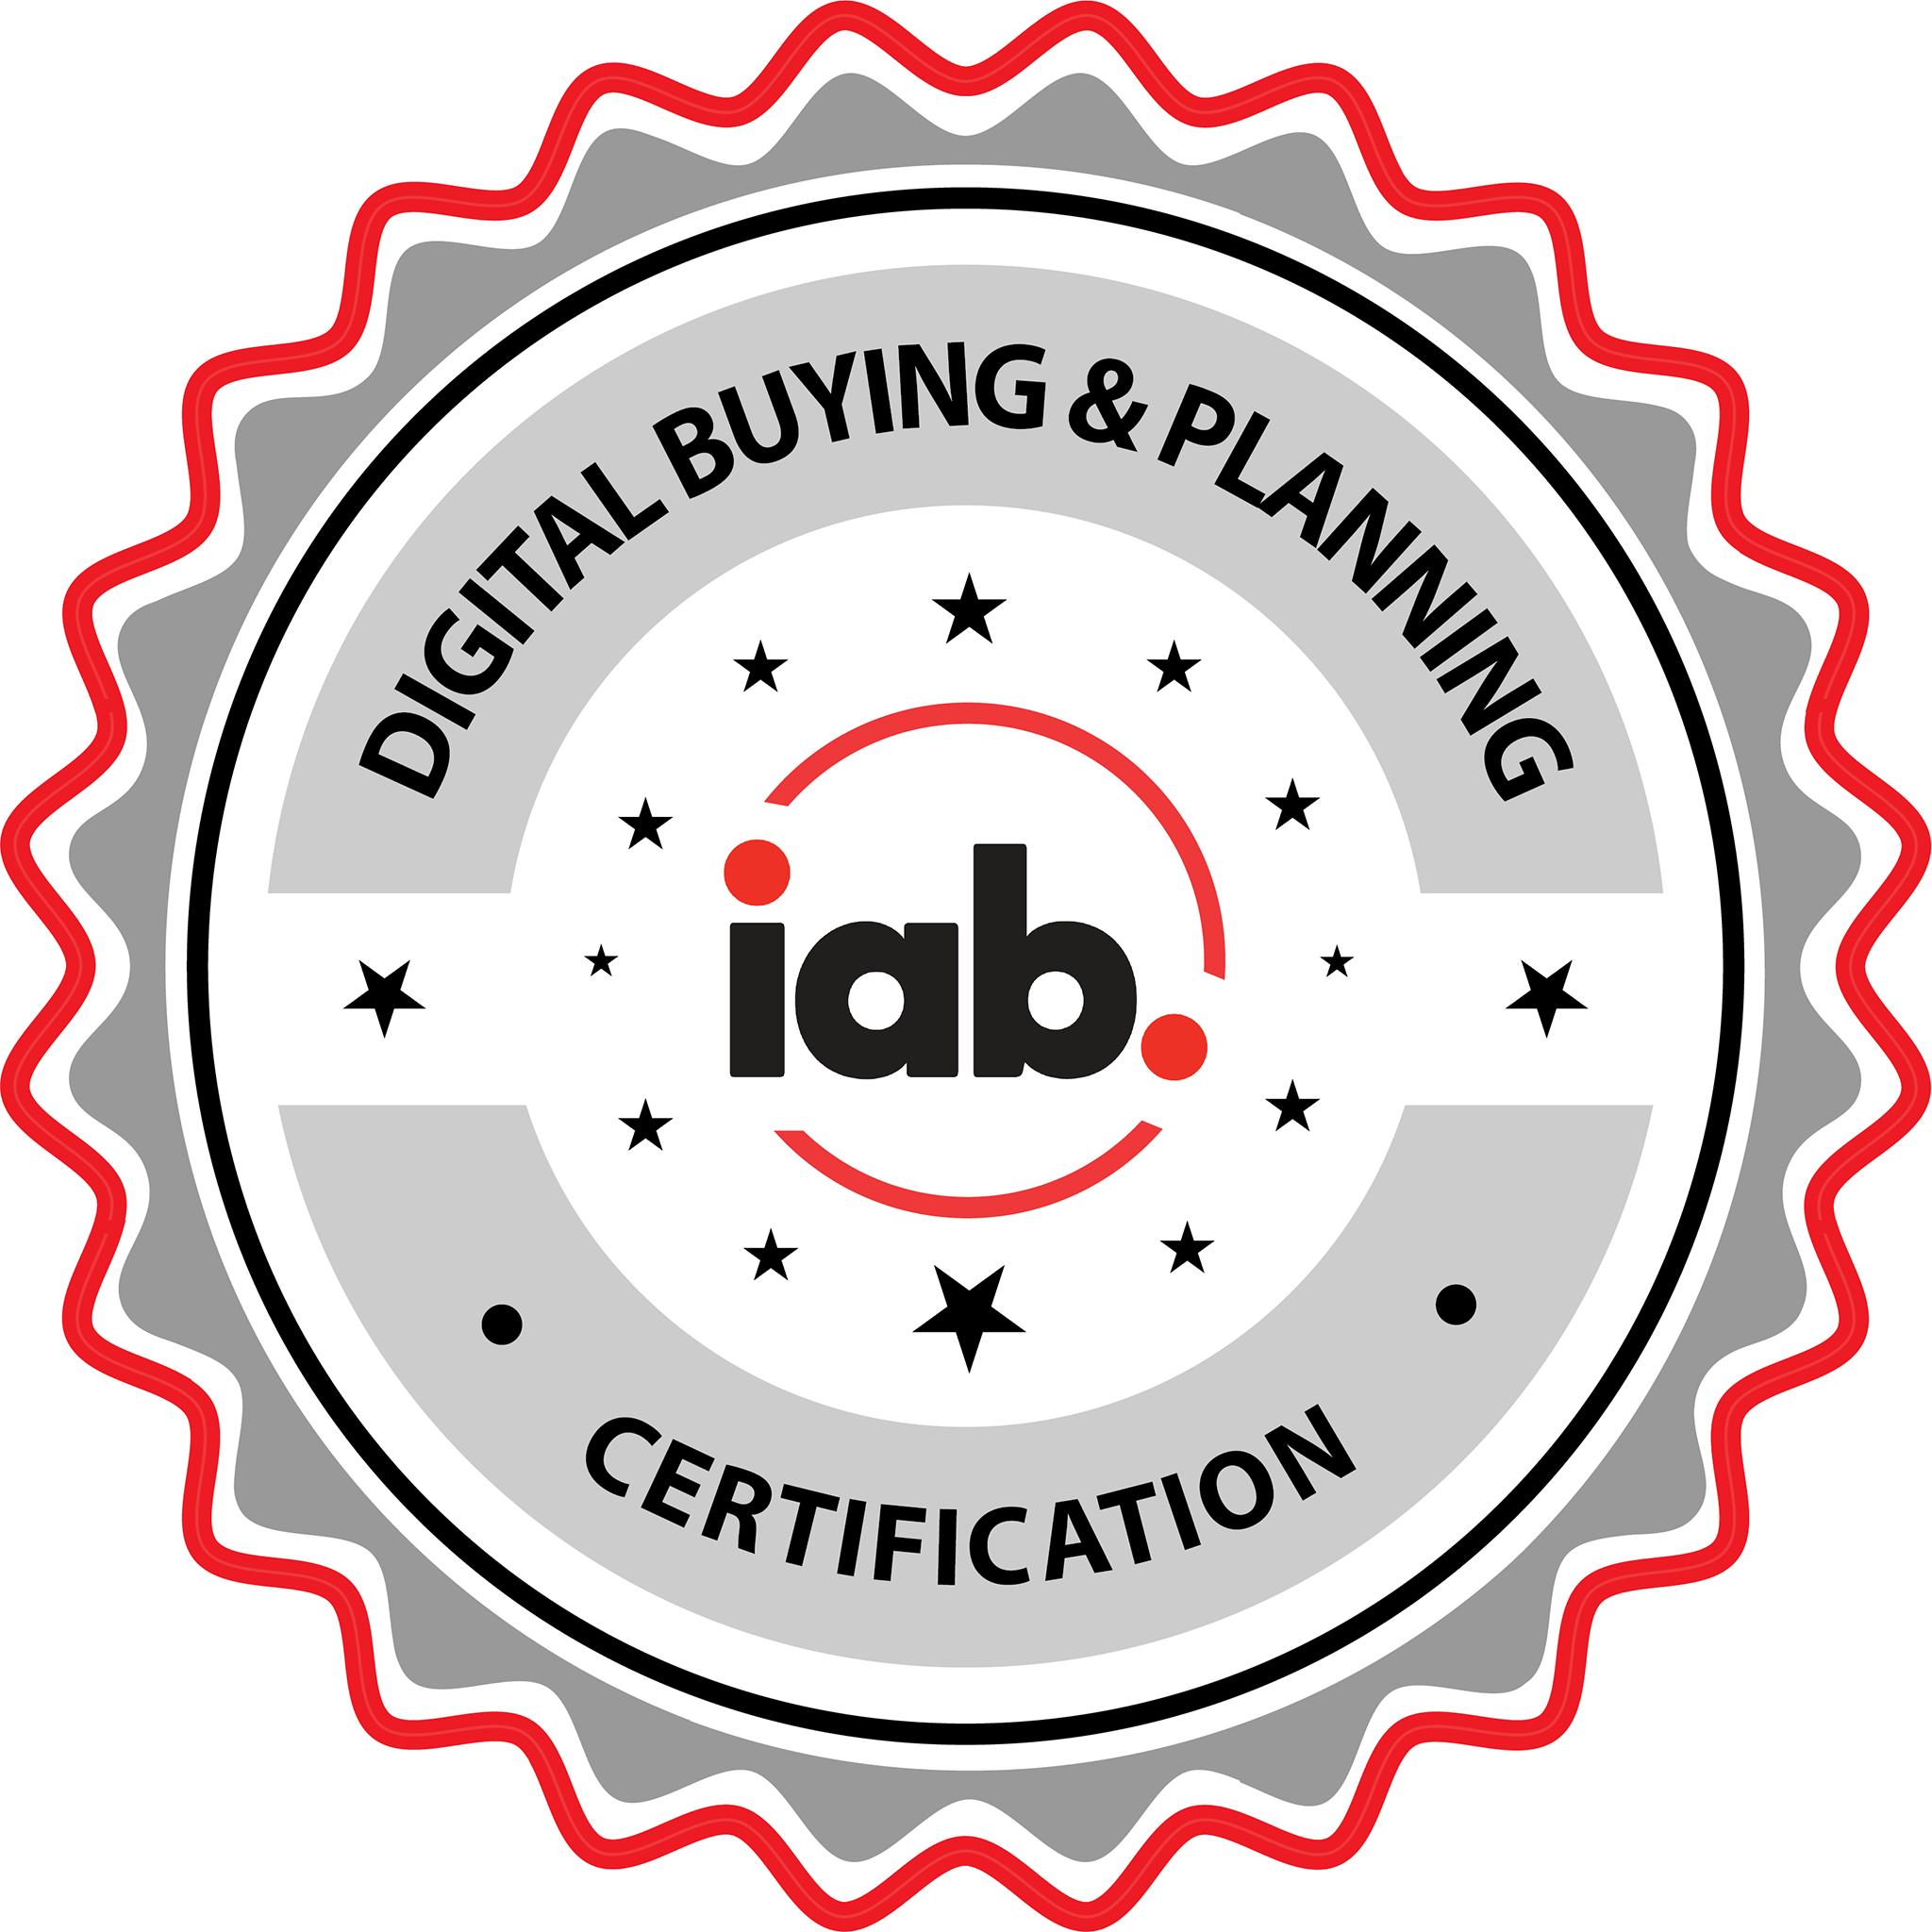 IAB Digital Media Buying & Planning Certification